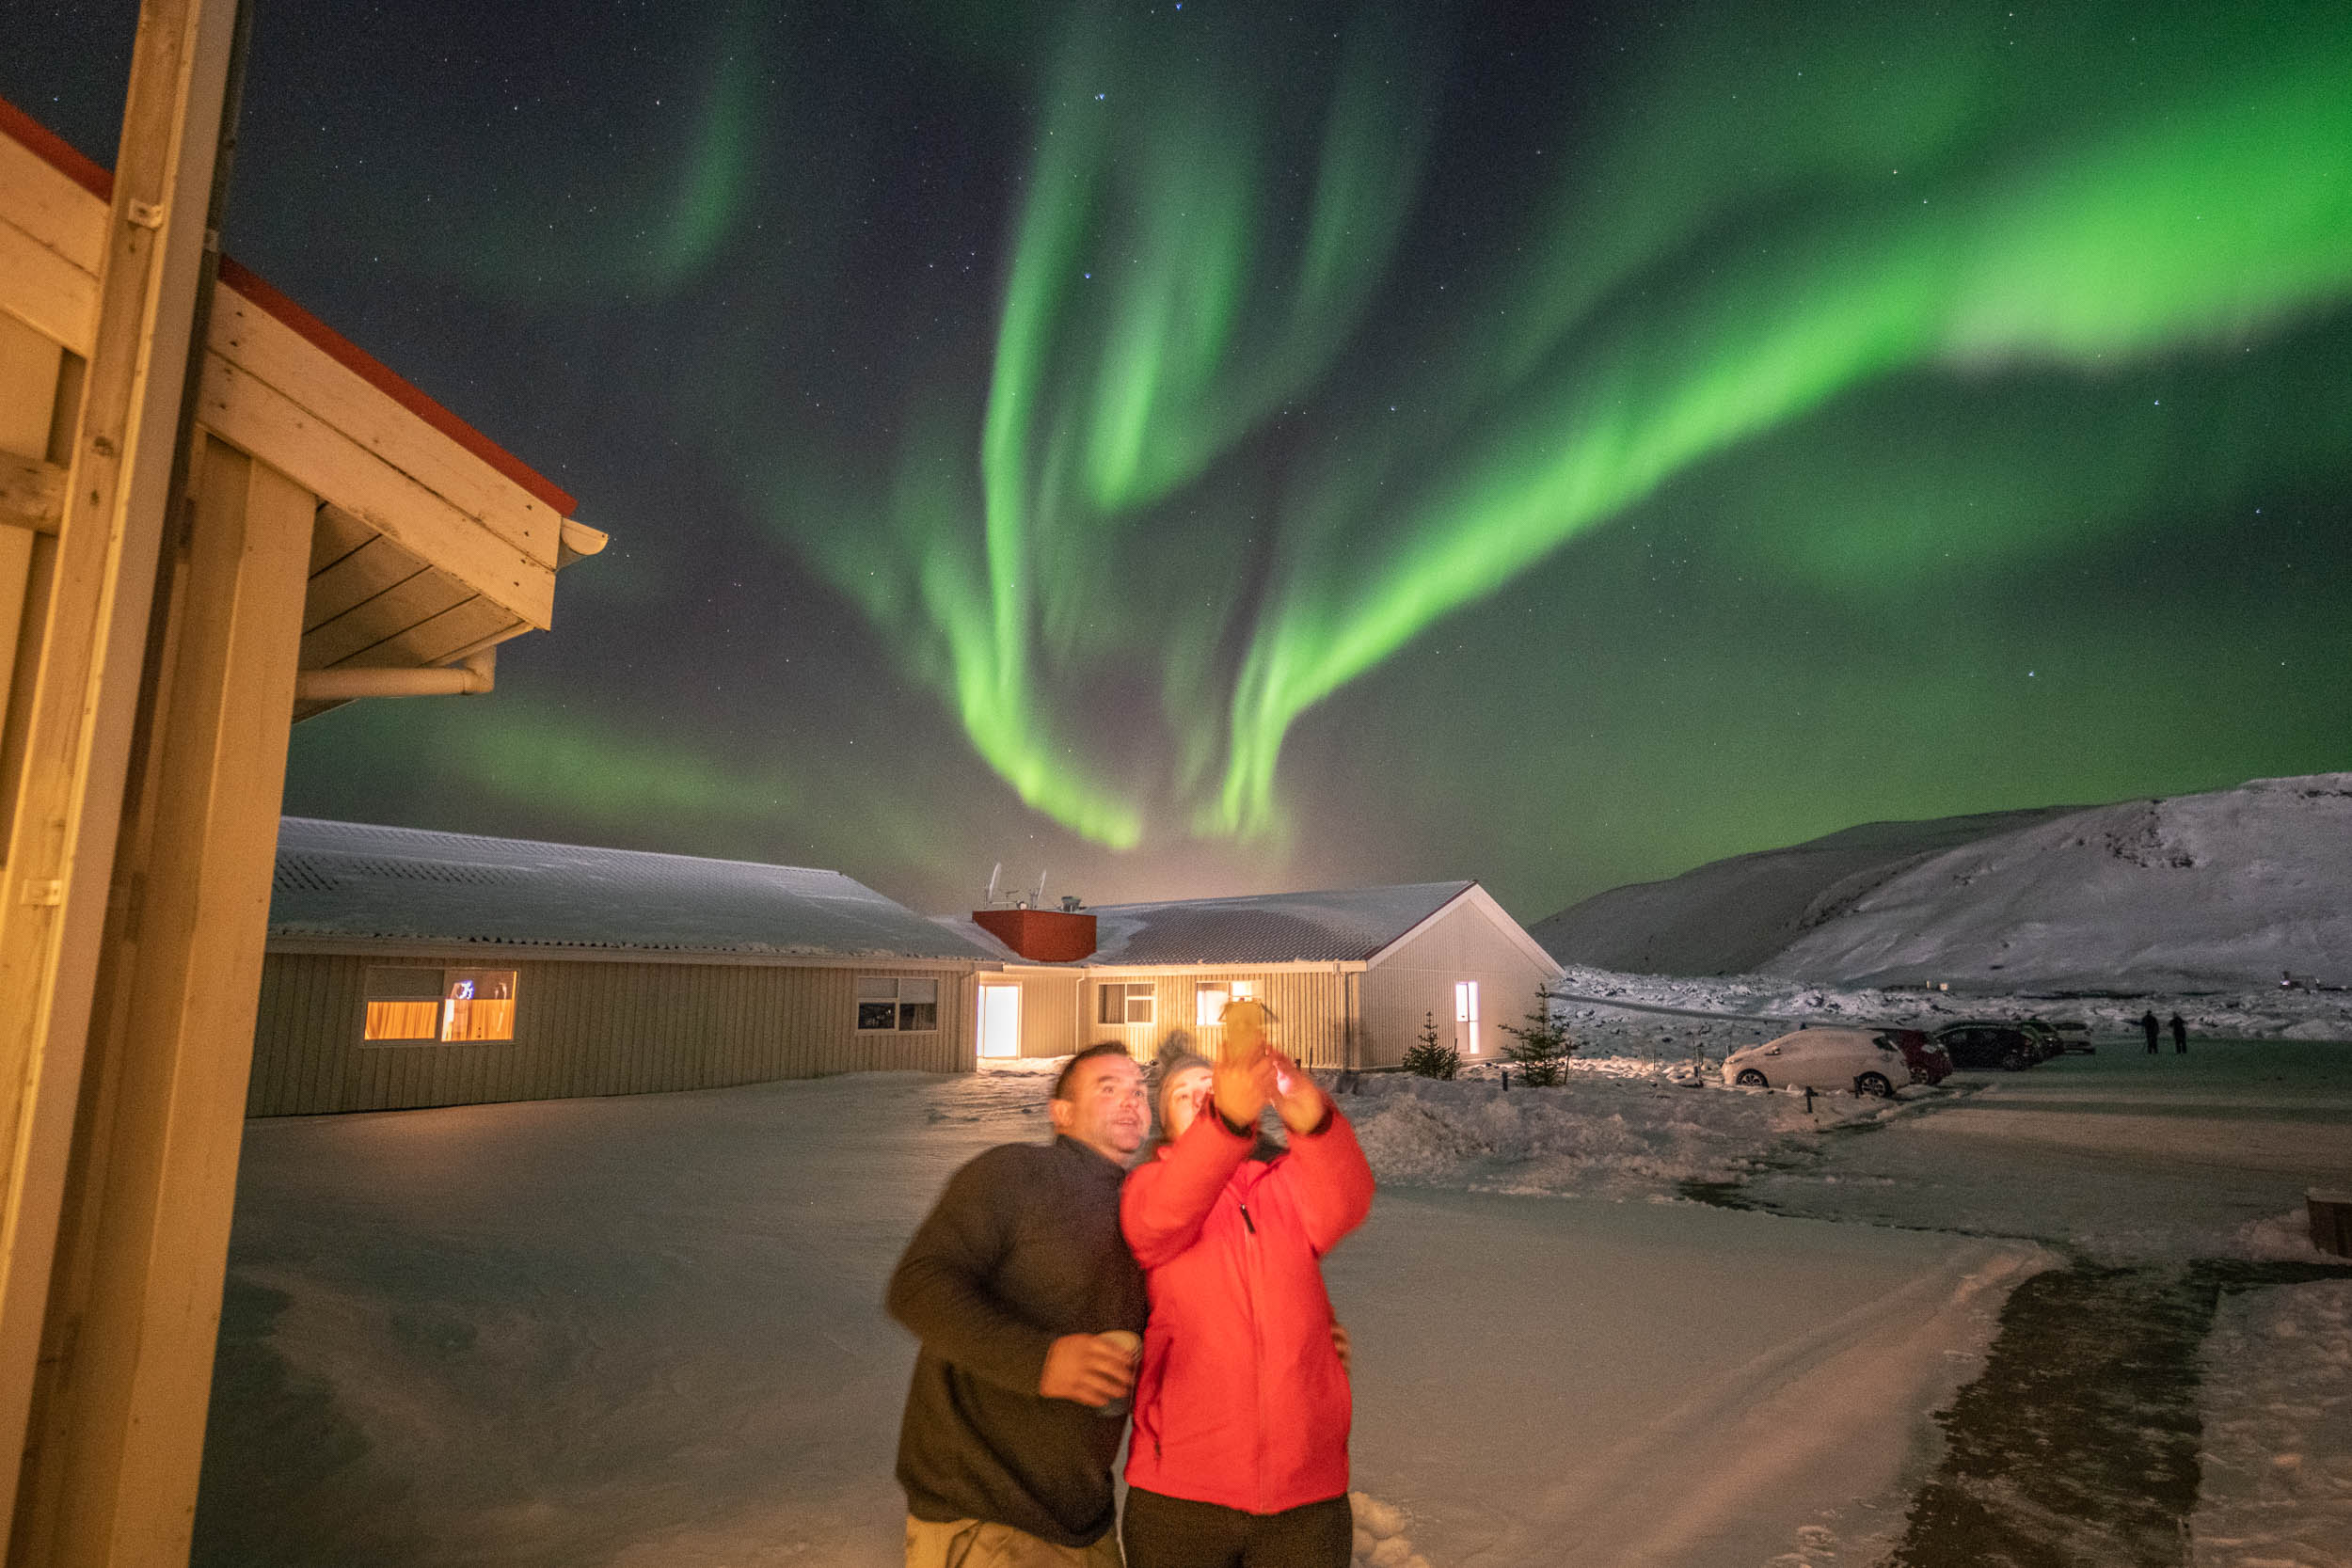 Aurora Borealis at Northern Light Inn, Iceland.